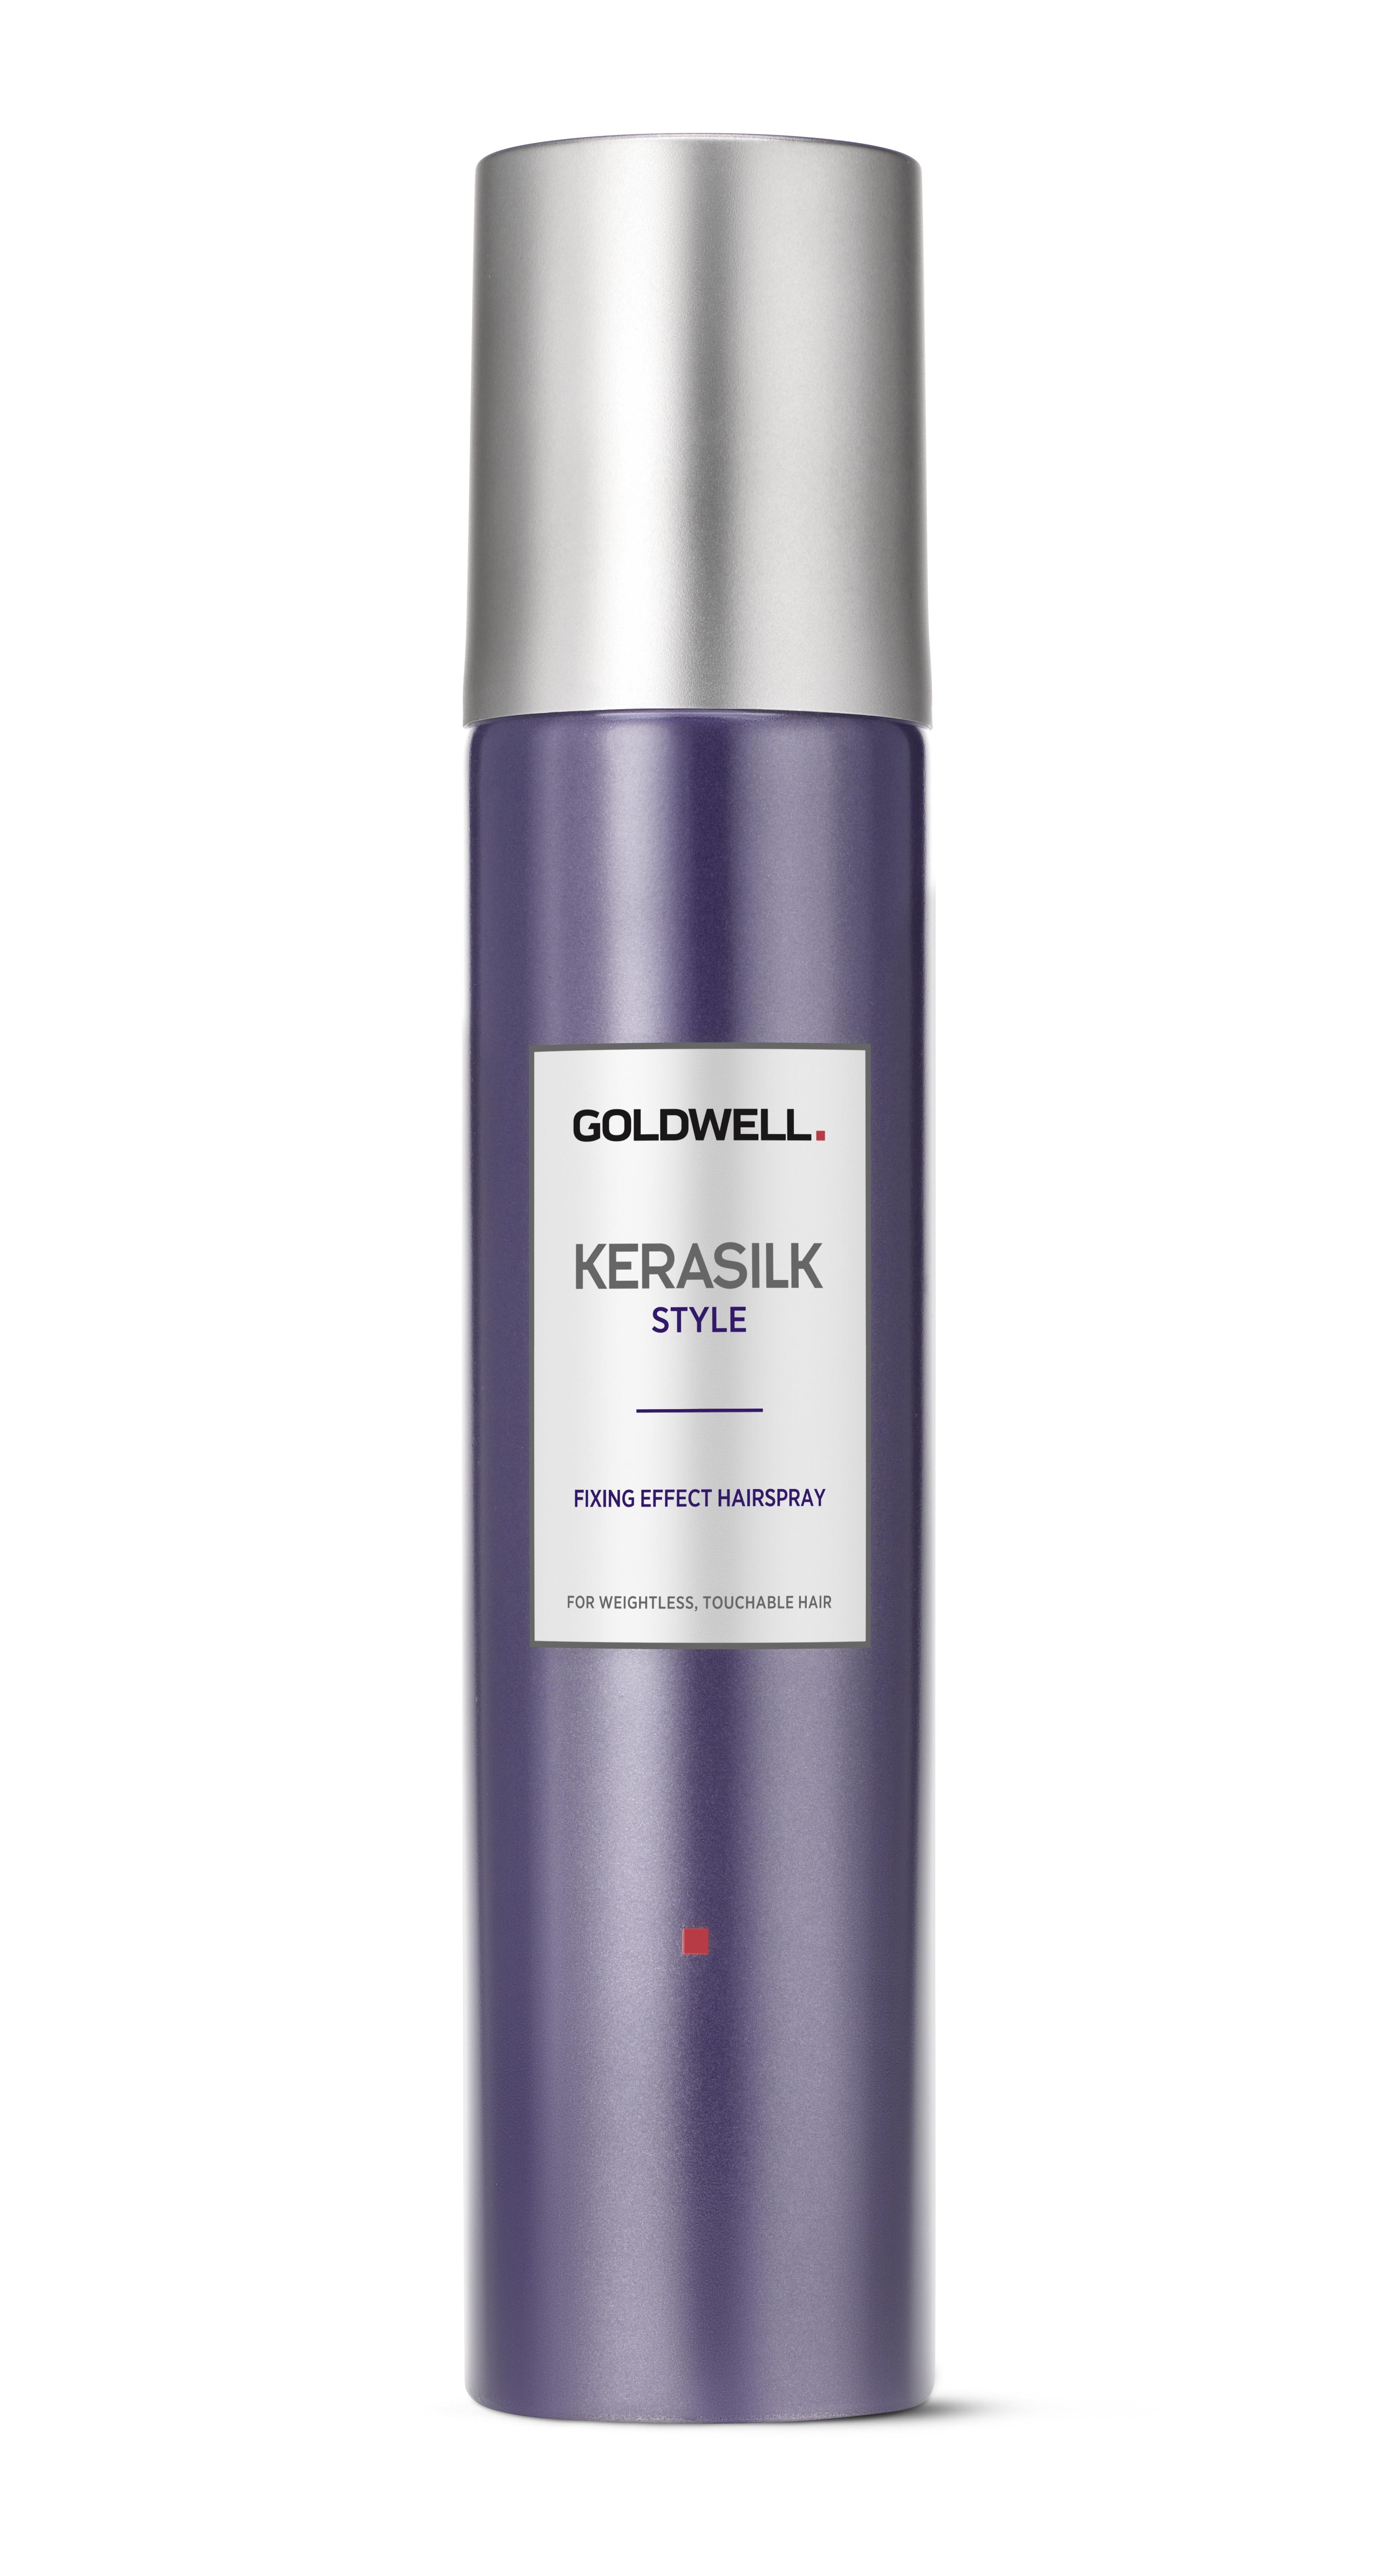 Goldwell Introduces Kerasilk Style Line